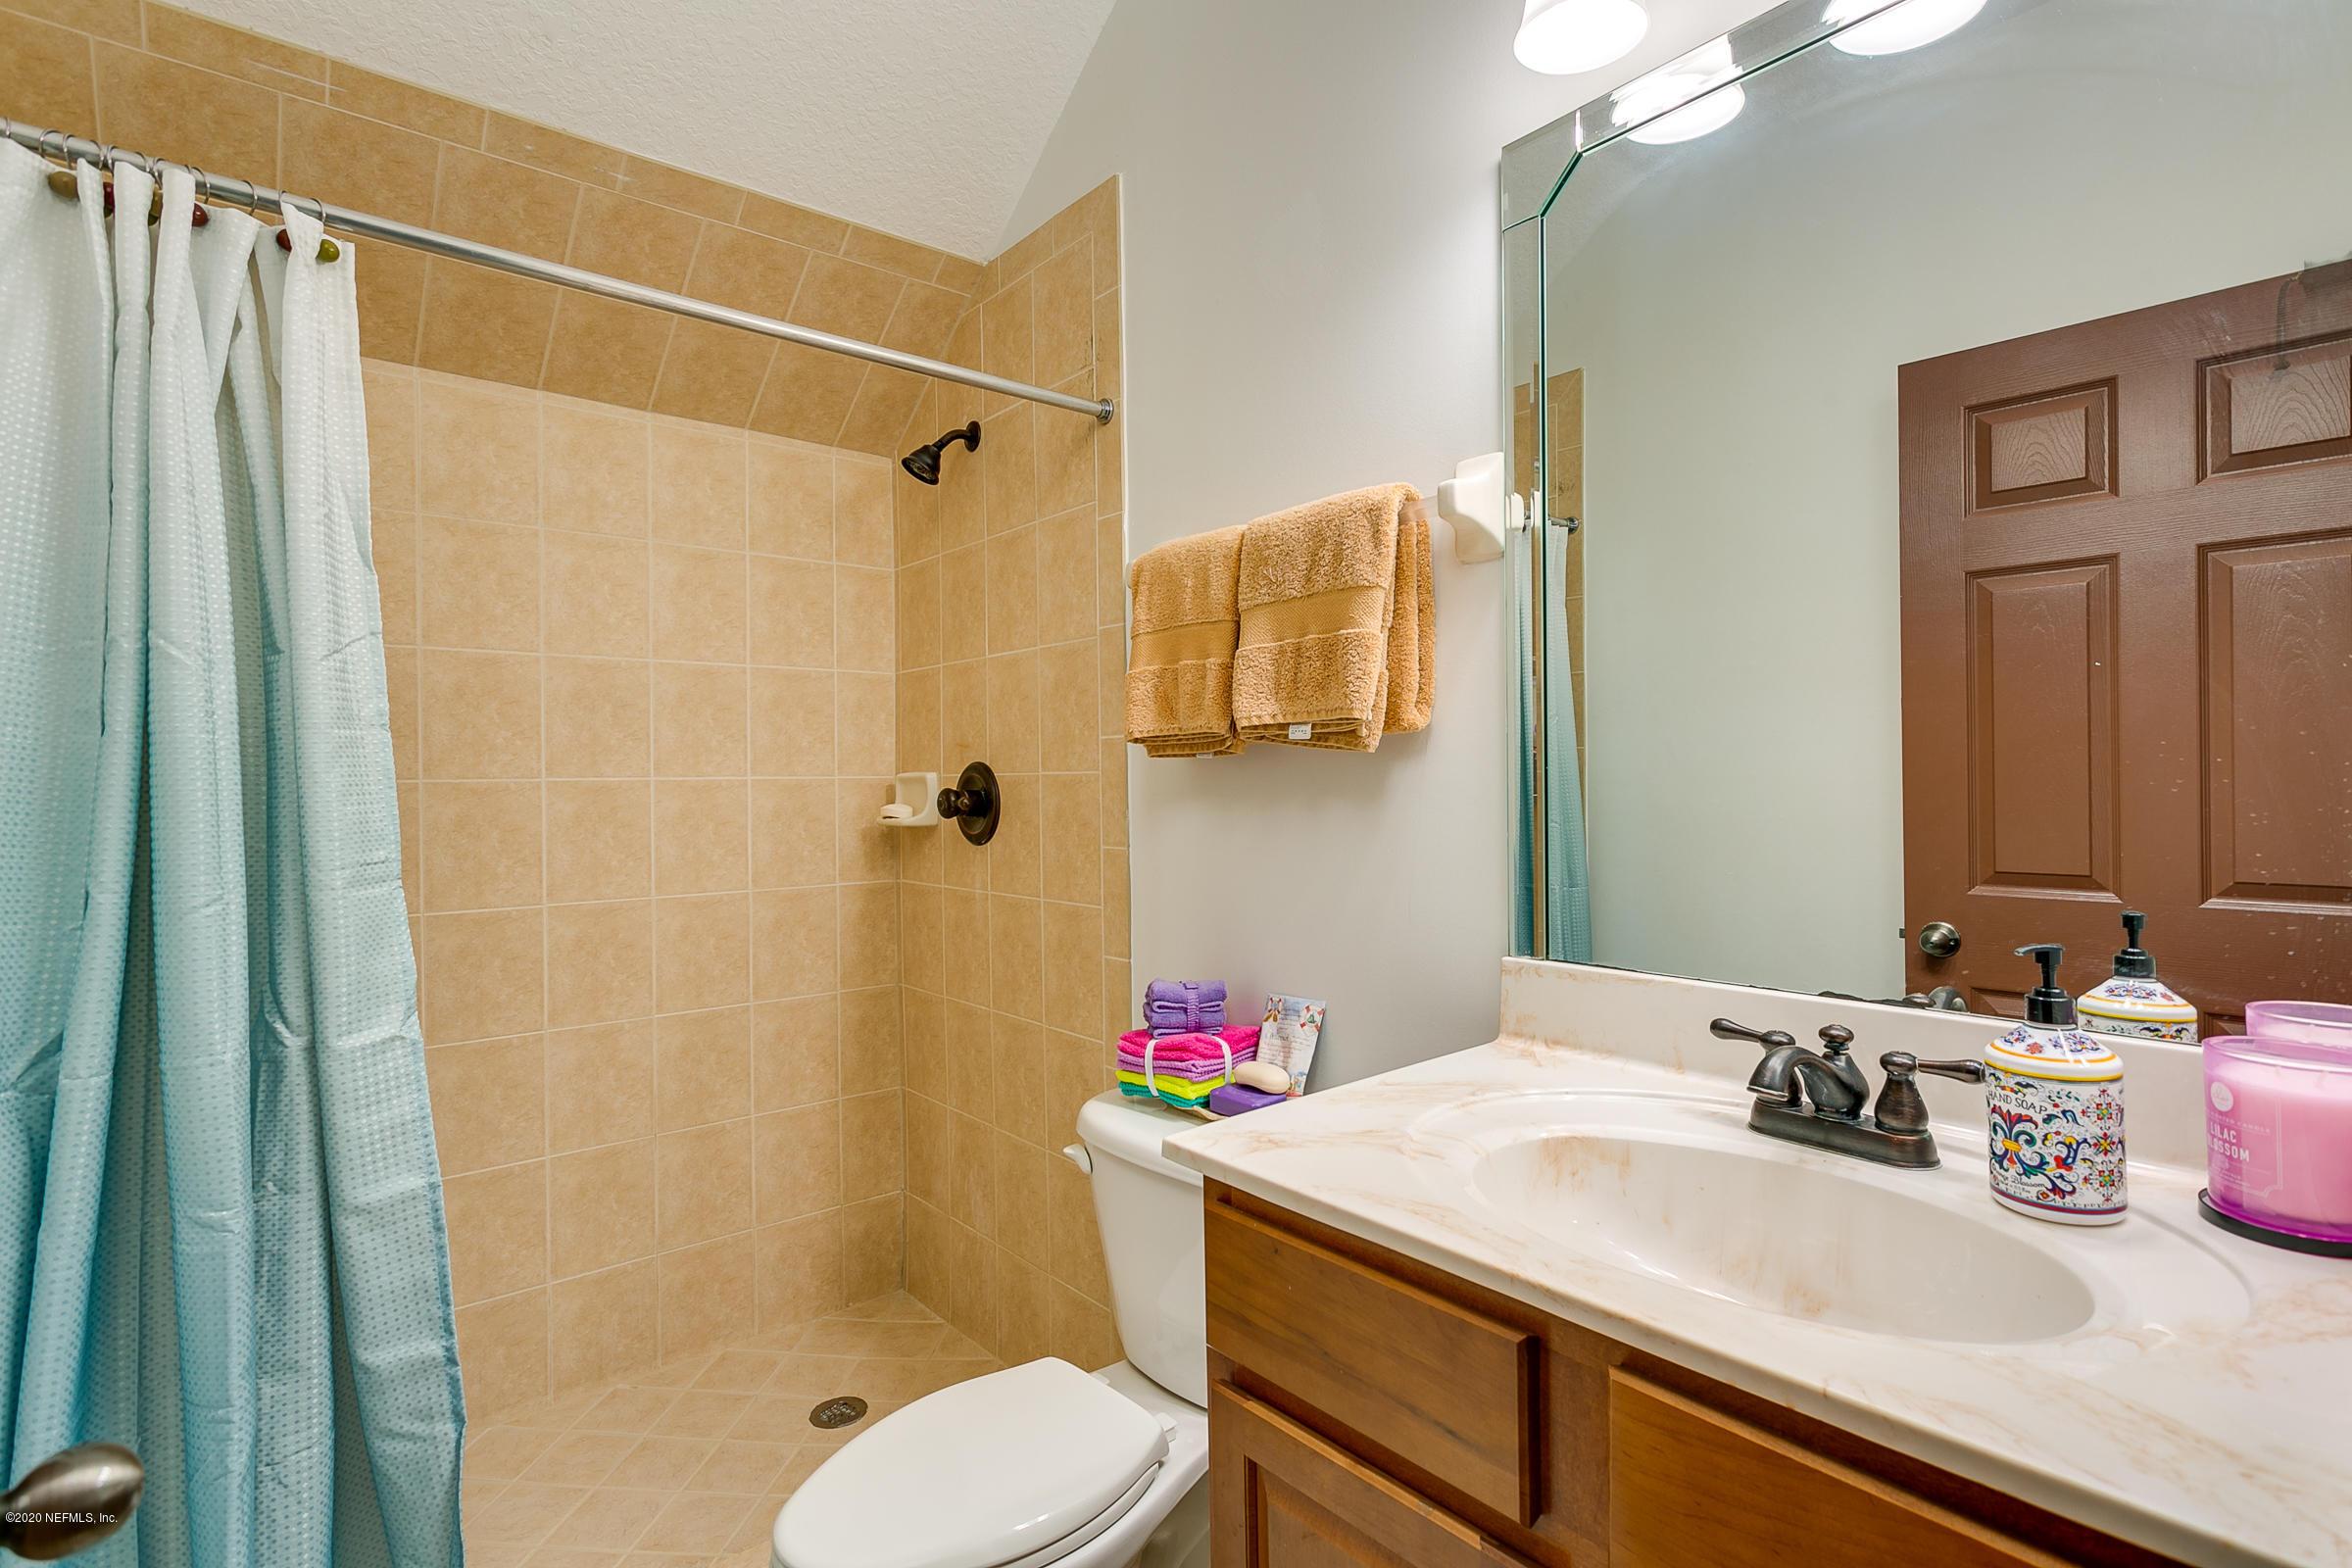 3545 OGLEBAY, GREEN COVE SPRINGS, FLORIDA 32043, 5 Bedrooms Bedrooms, ,4 BathroomsBathrooms,Residential,For sale,OGLEBAY,1079771